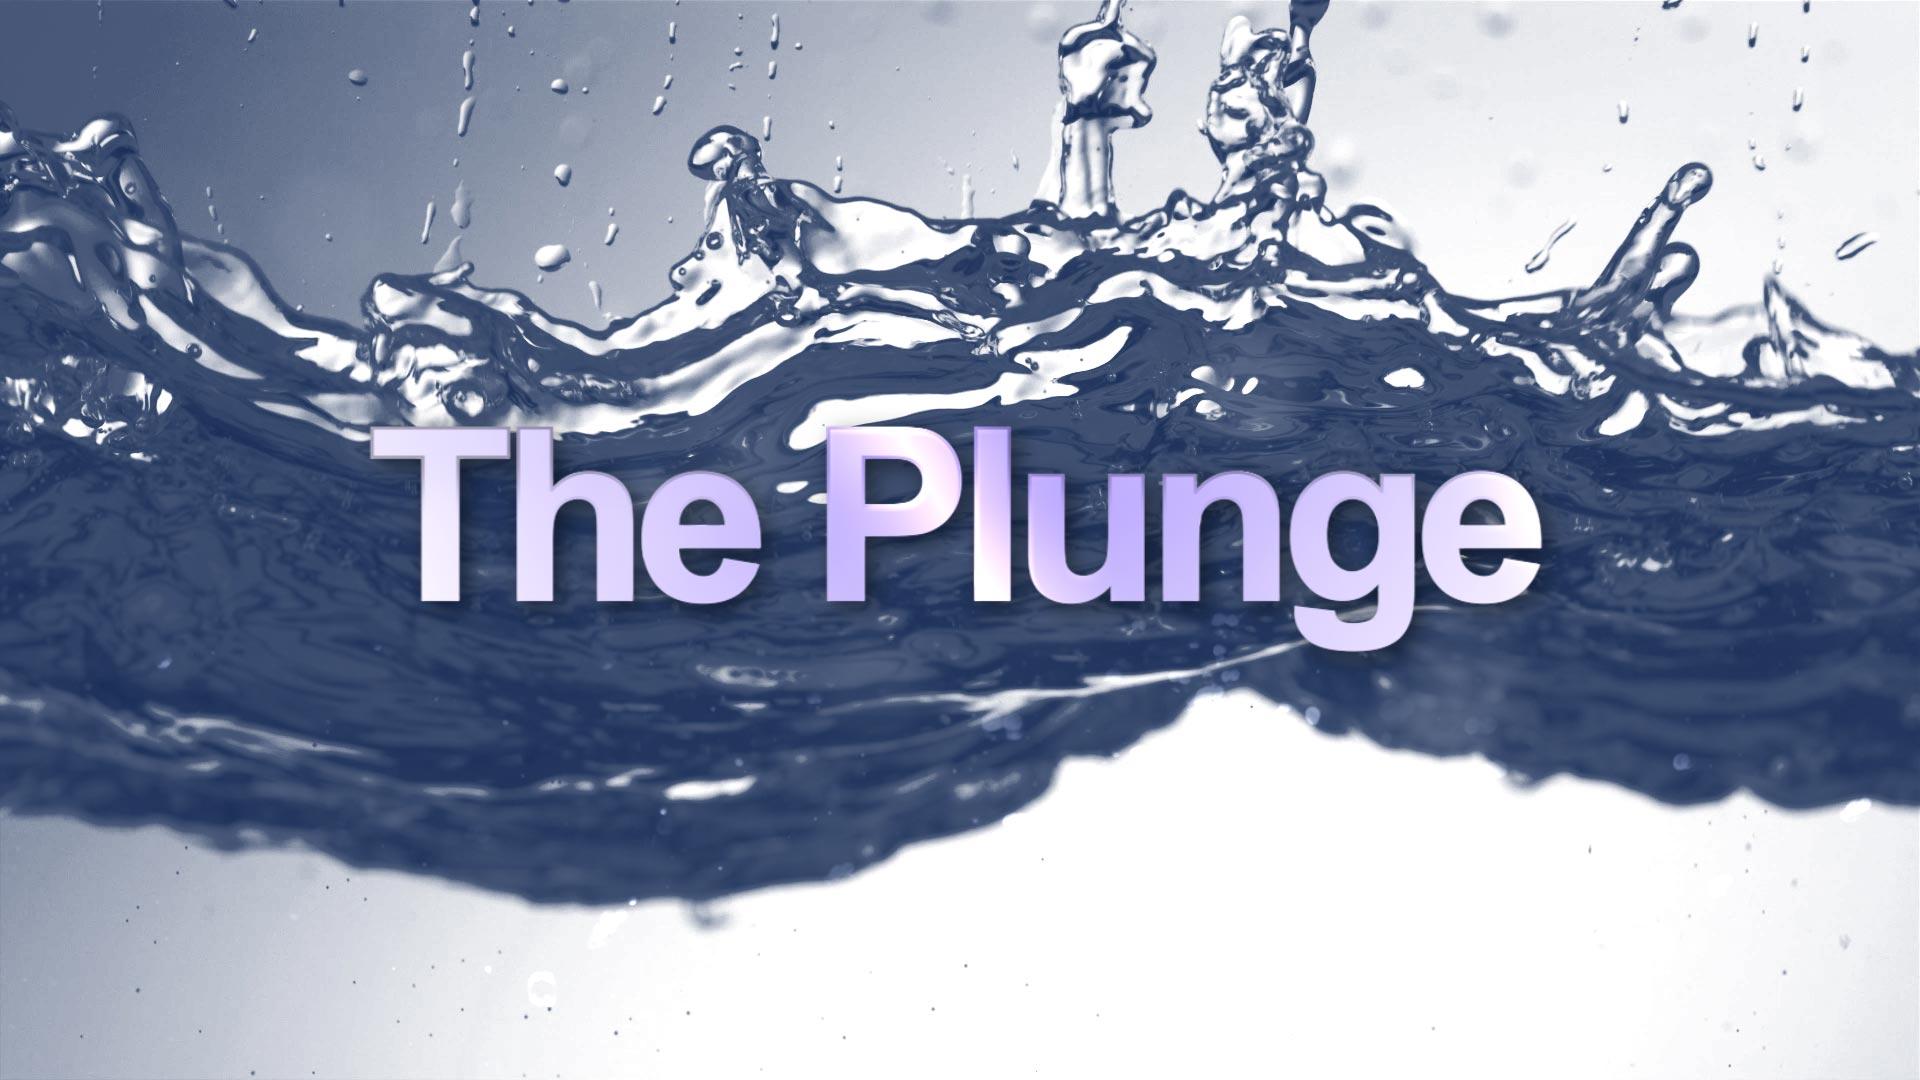 The-Plunge-Graphic.jpg